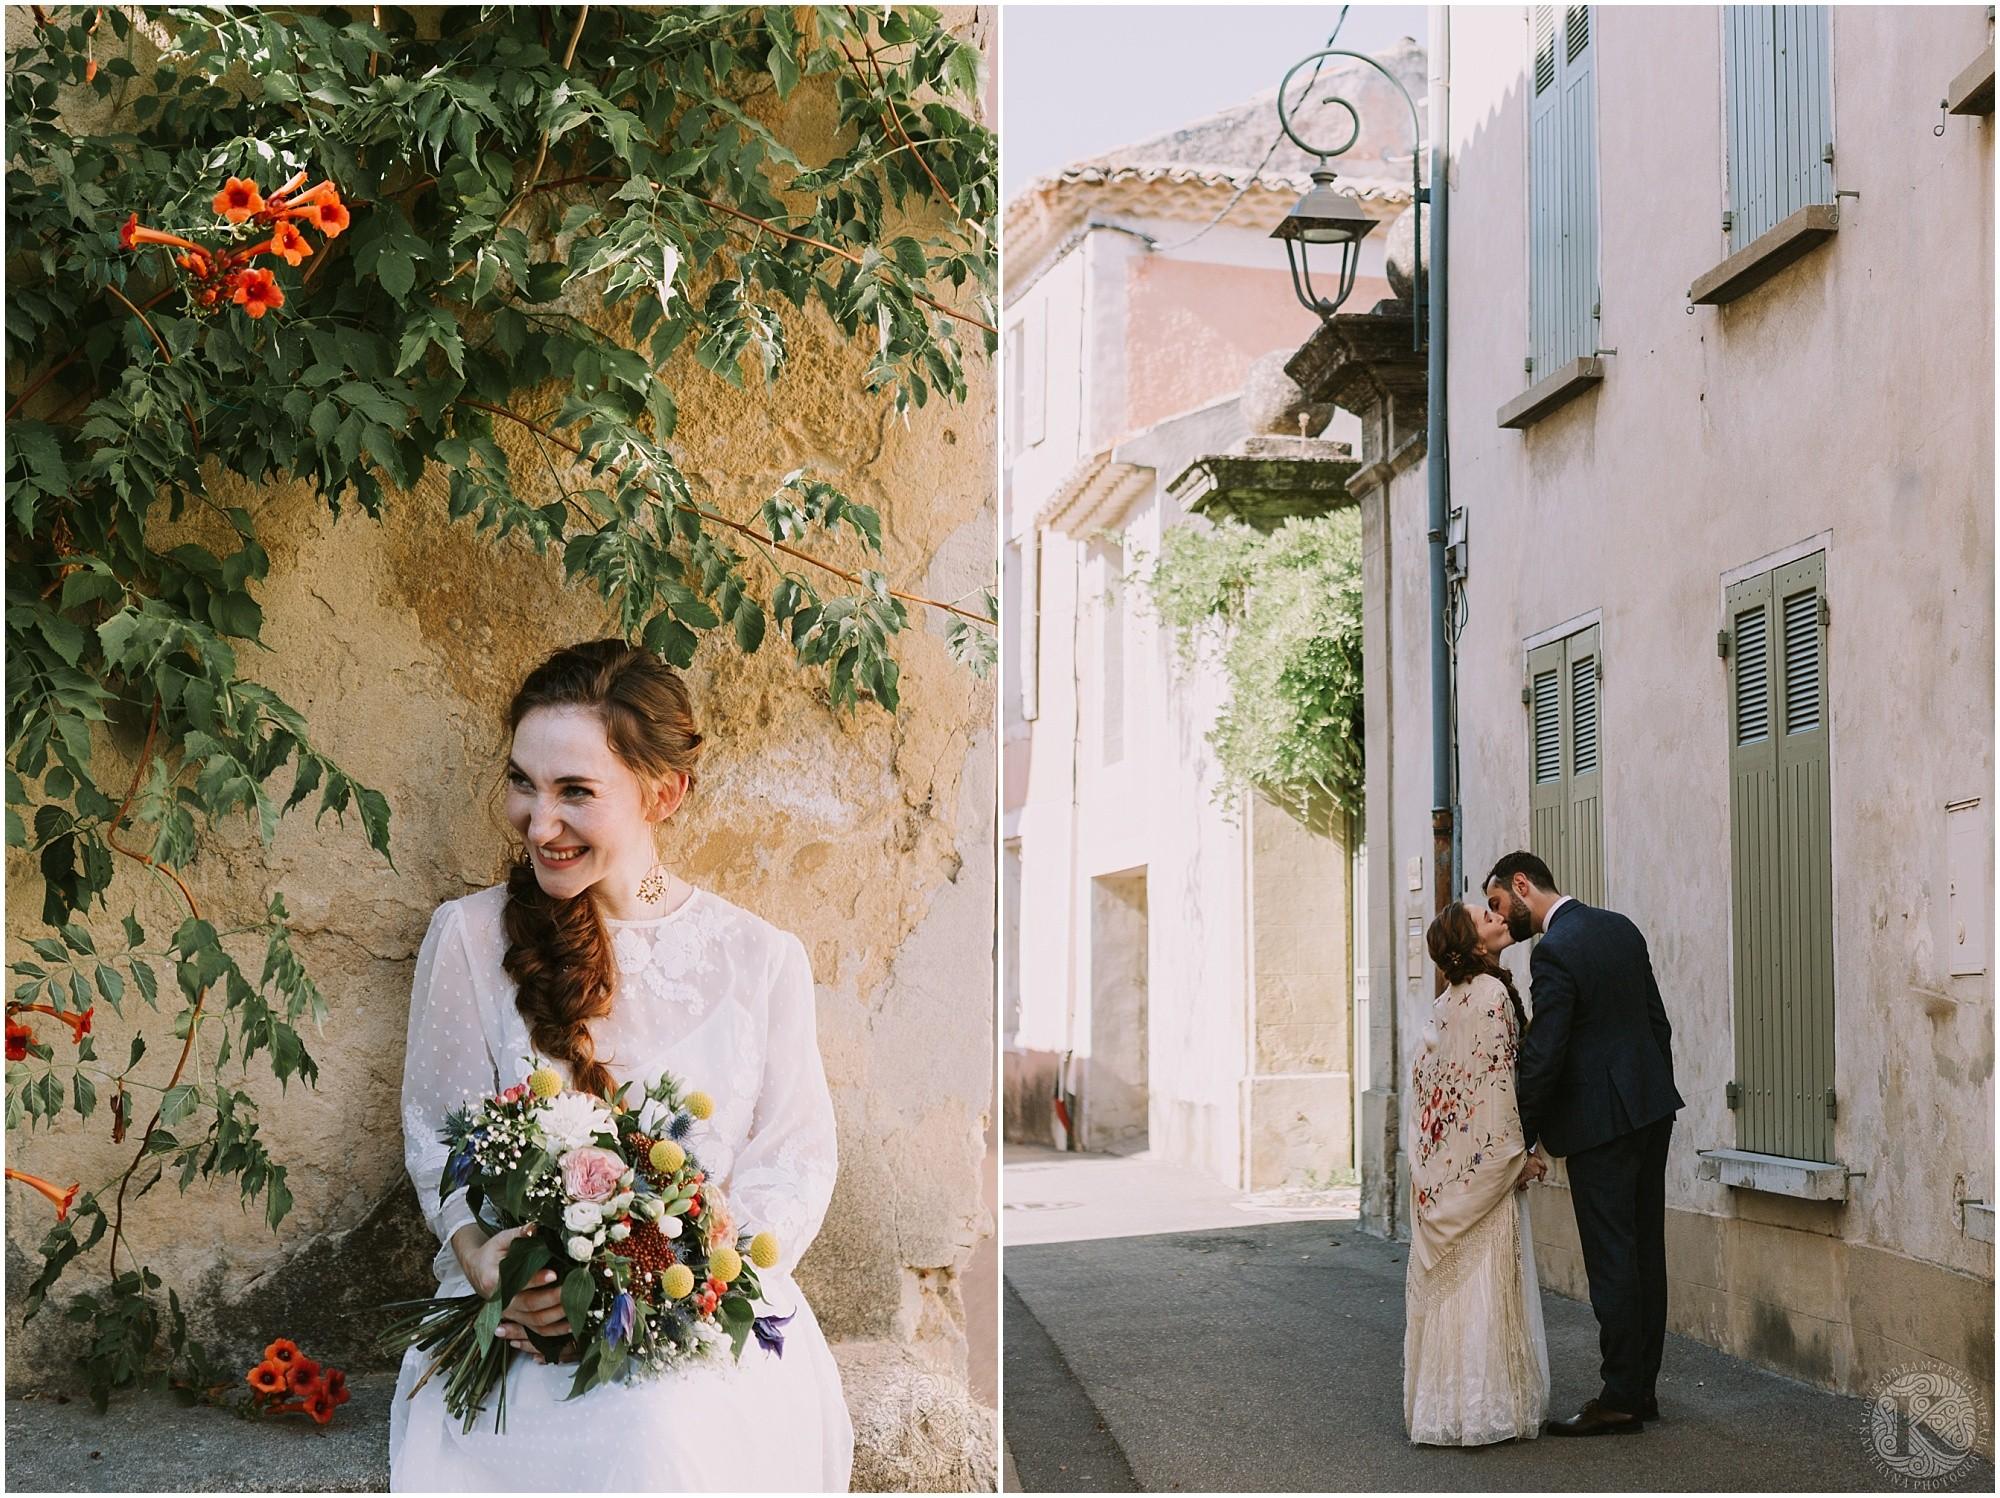 Kateryna-photos-photographe-mariage-vaucluse-provence-avignon-ferme-st-hugues_0048.jpg